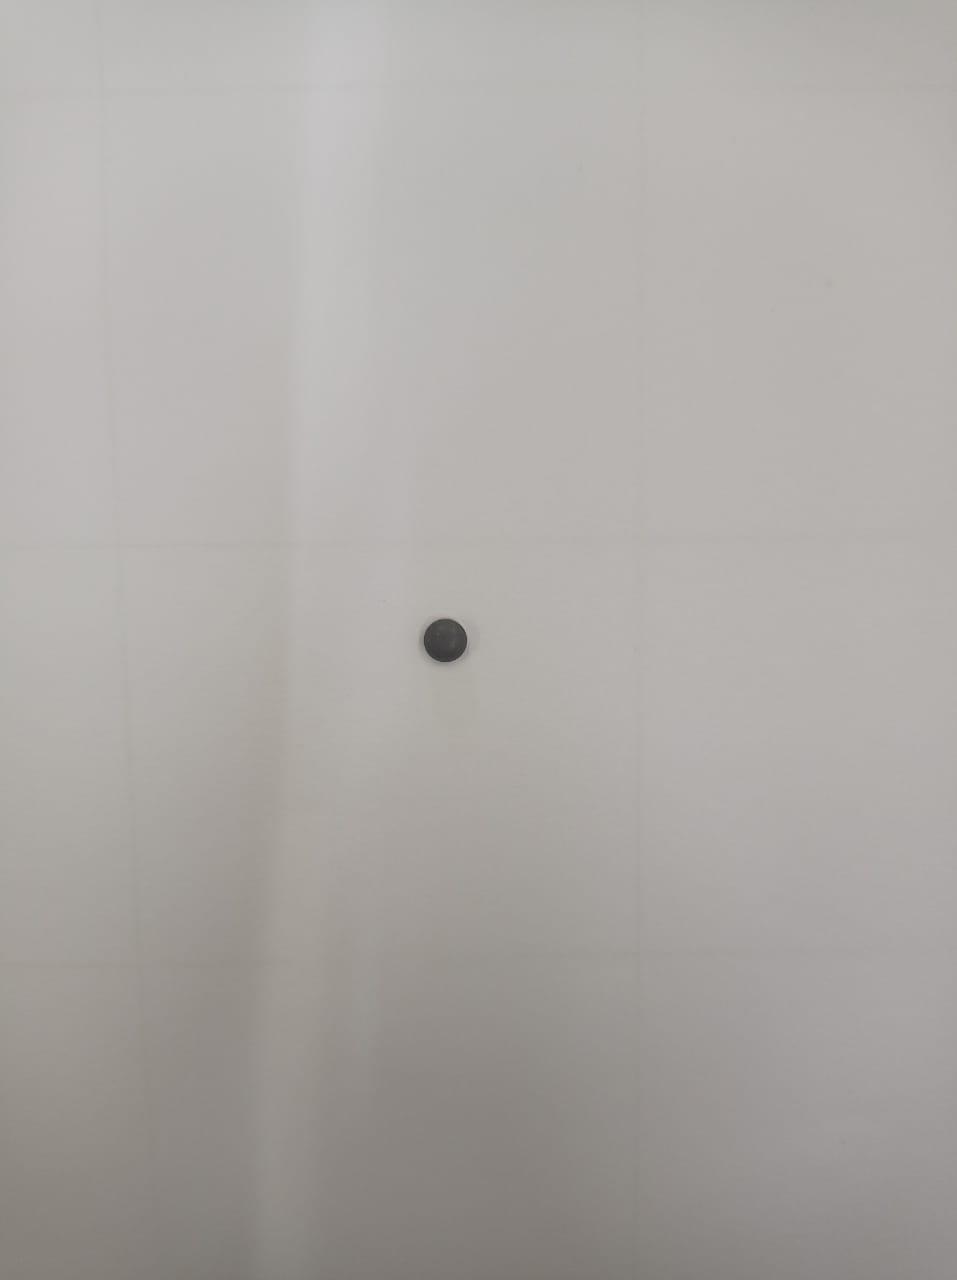 Magneto 3B 630 Pequeno 5x3MM